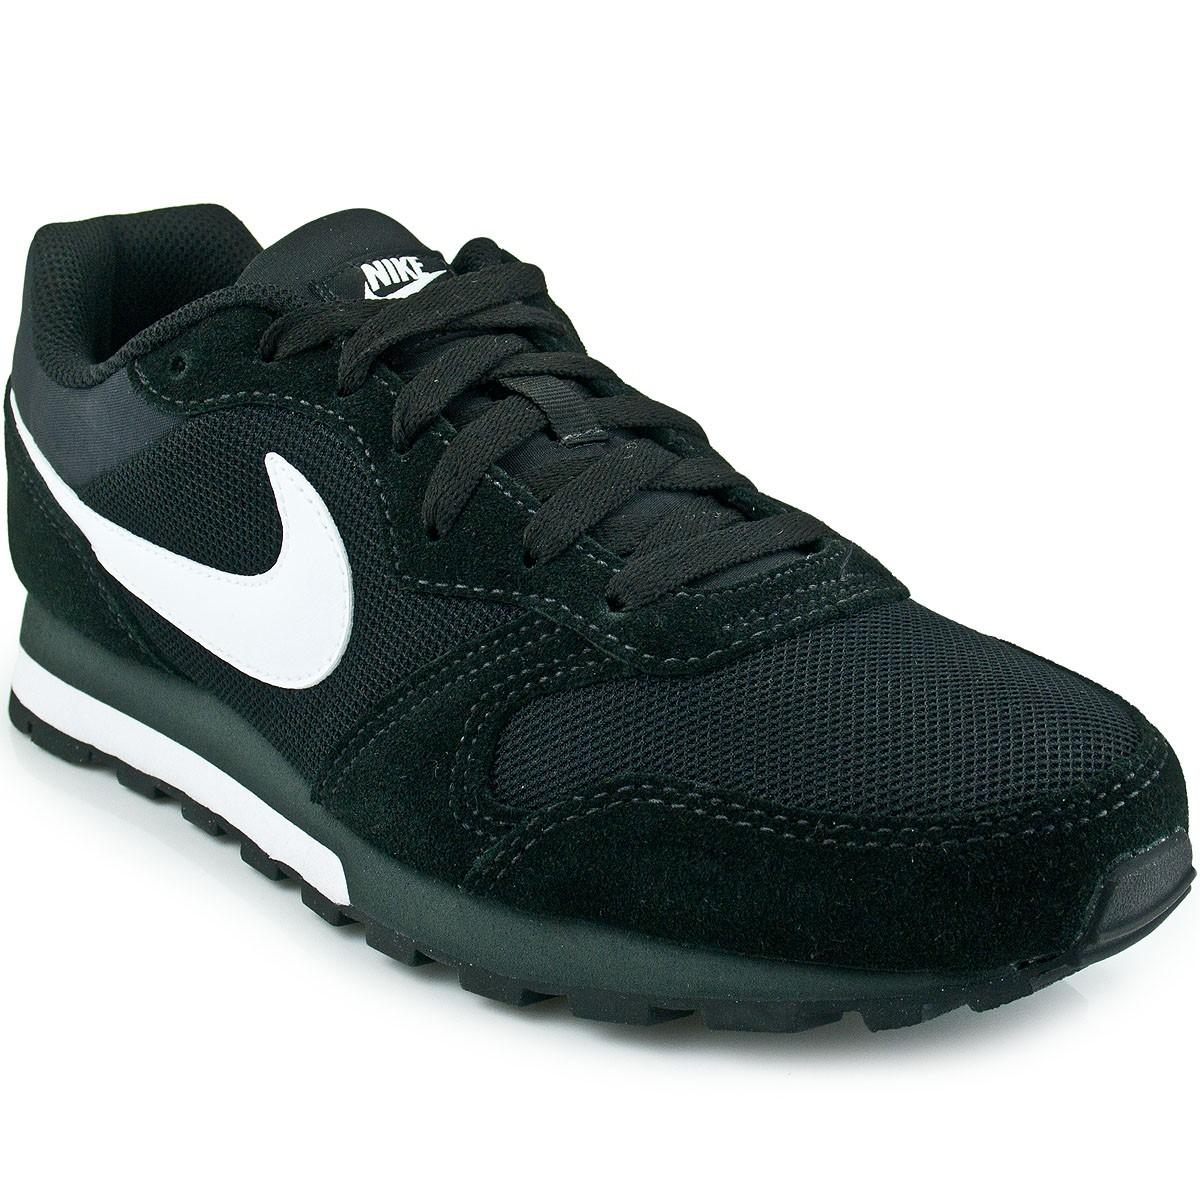 6626664508 Tênis Nike MD Runner 2 749794